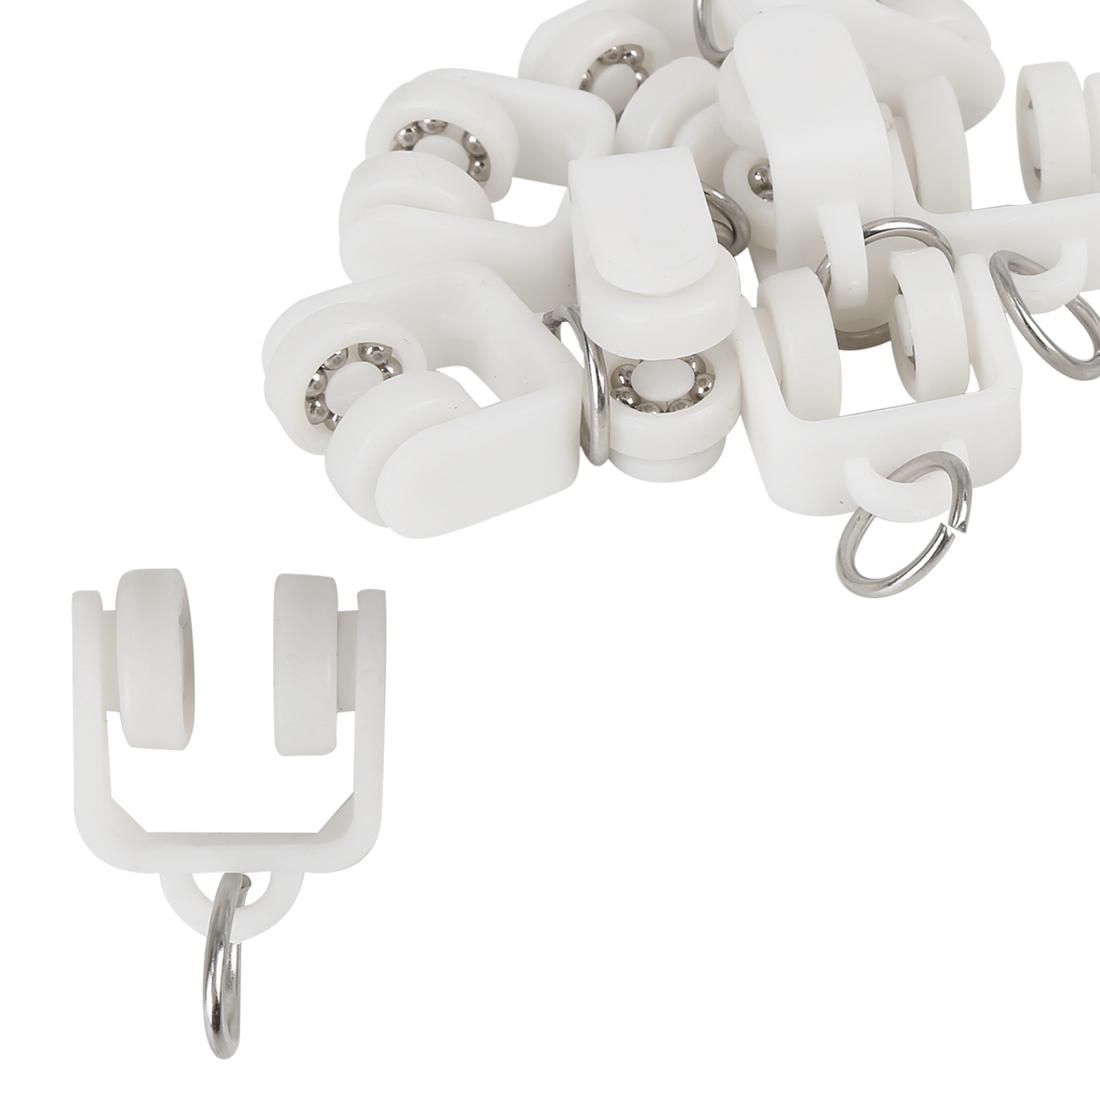 10pcs Plastic Car Curtain Track Rollers for RV Caravan Motorhomes 21 x 35mm